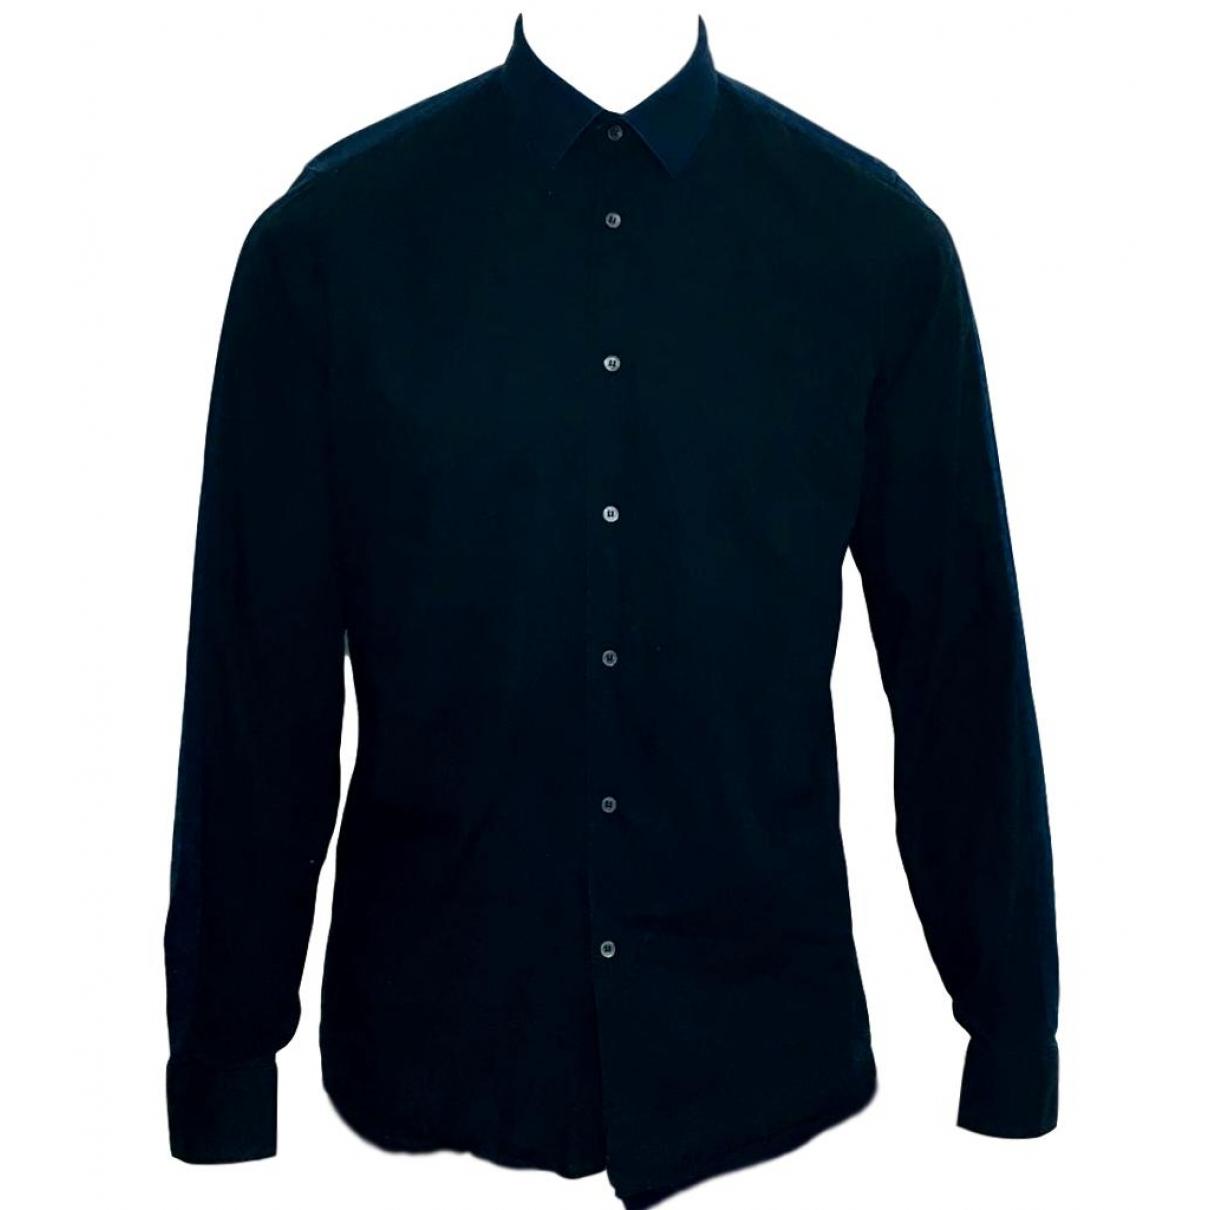 Miu Miu \N Black Cotton Shirts for Men M International